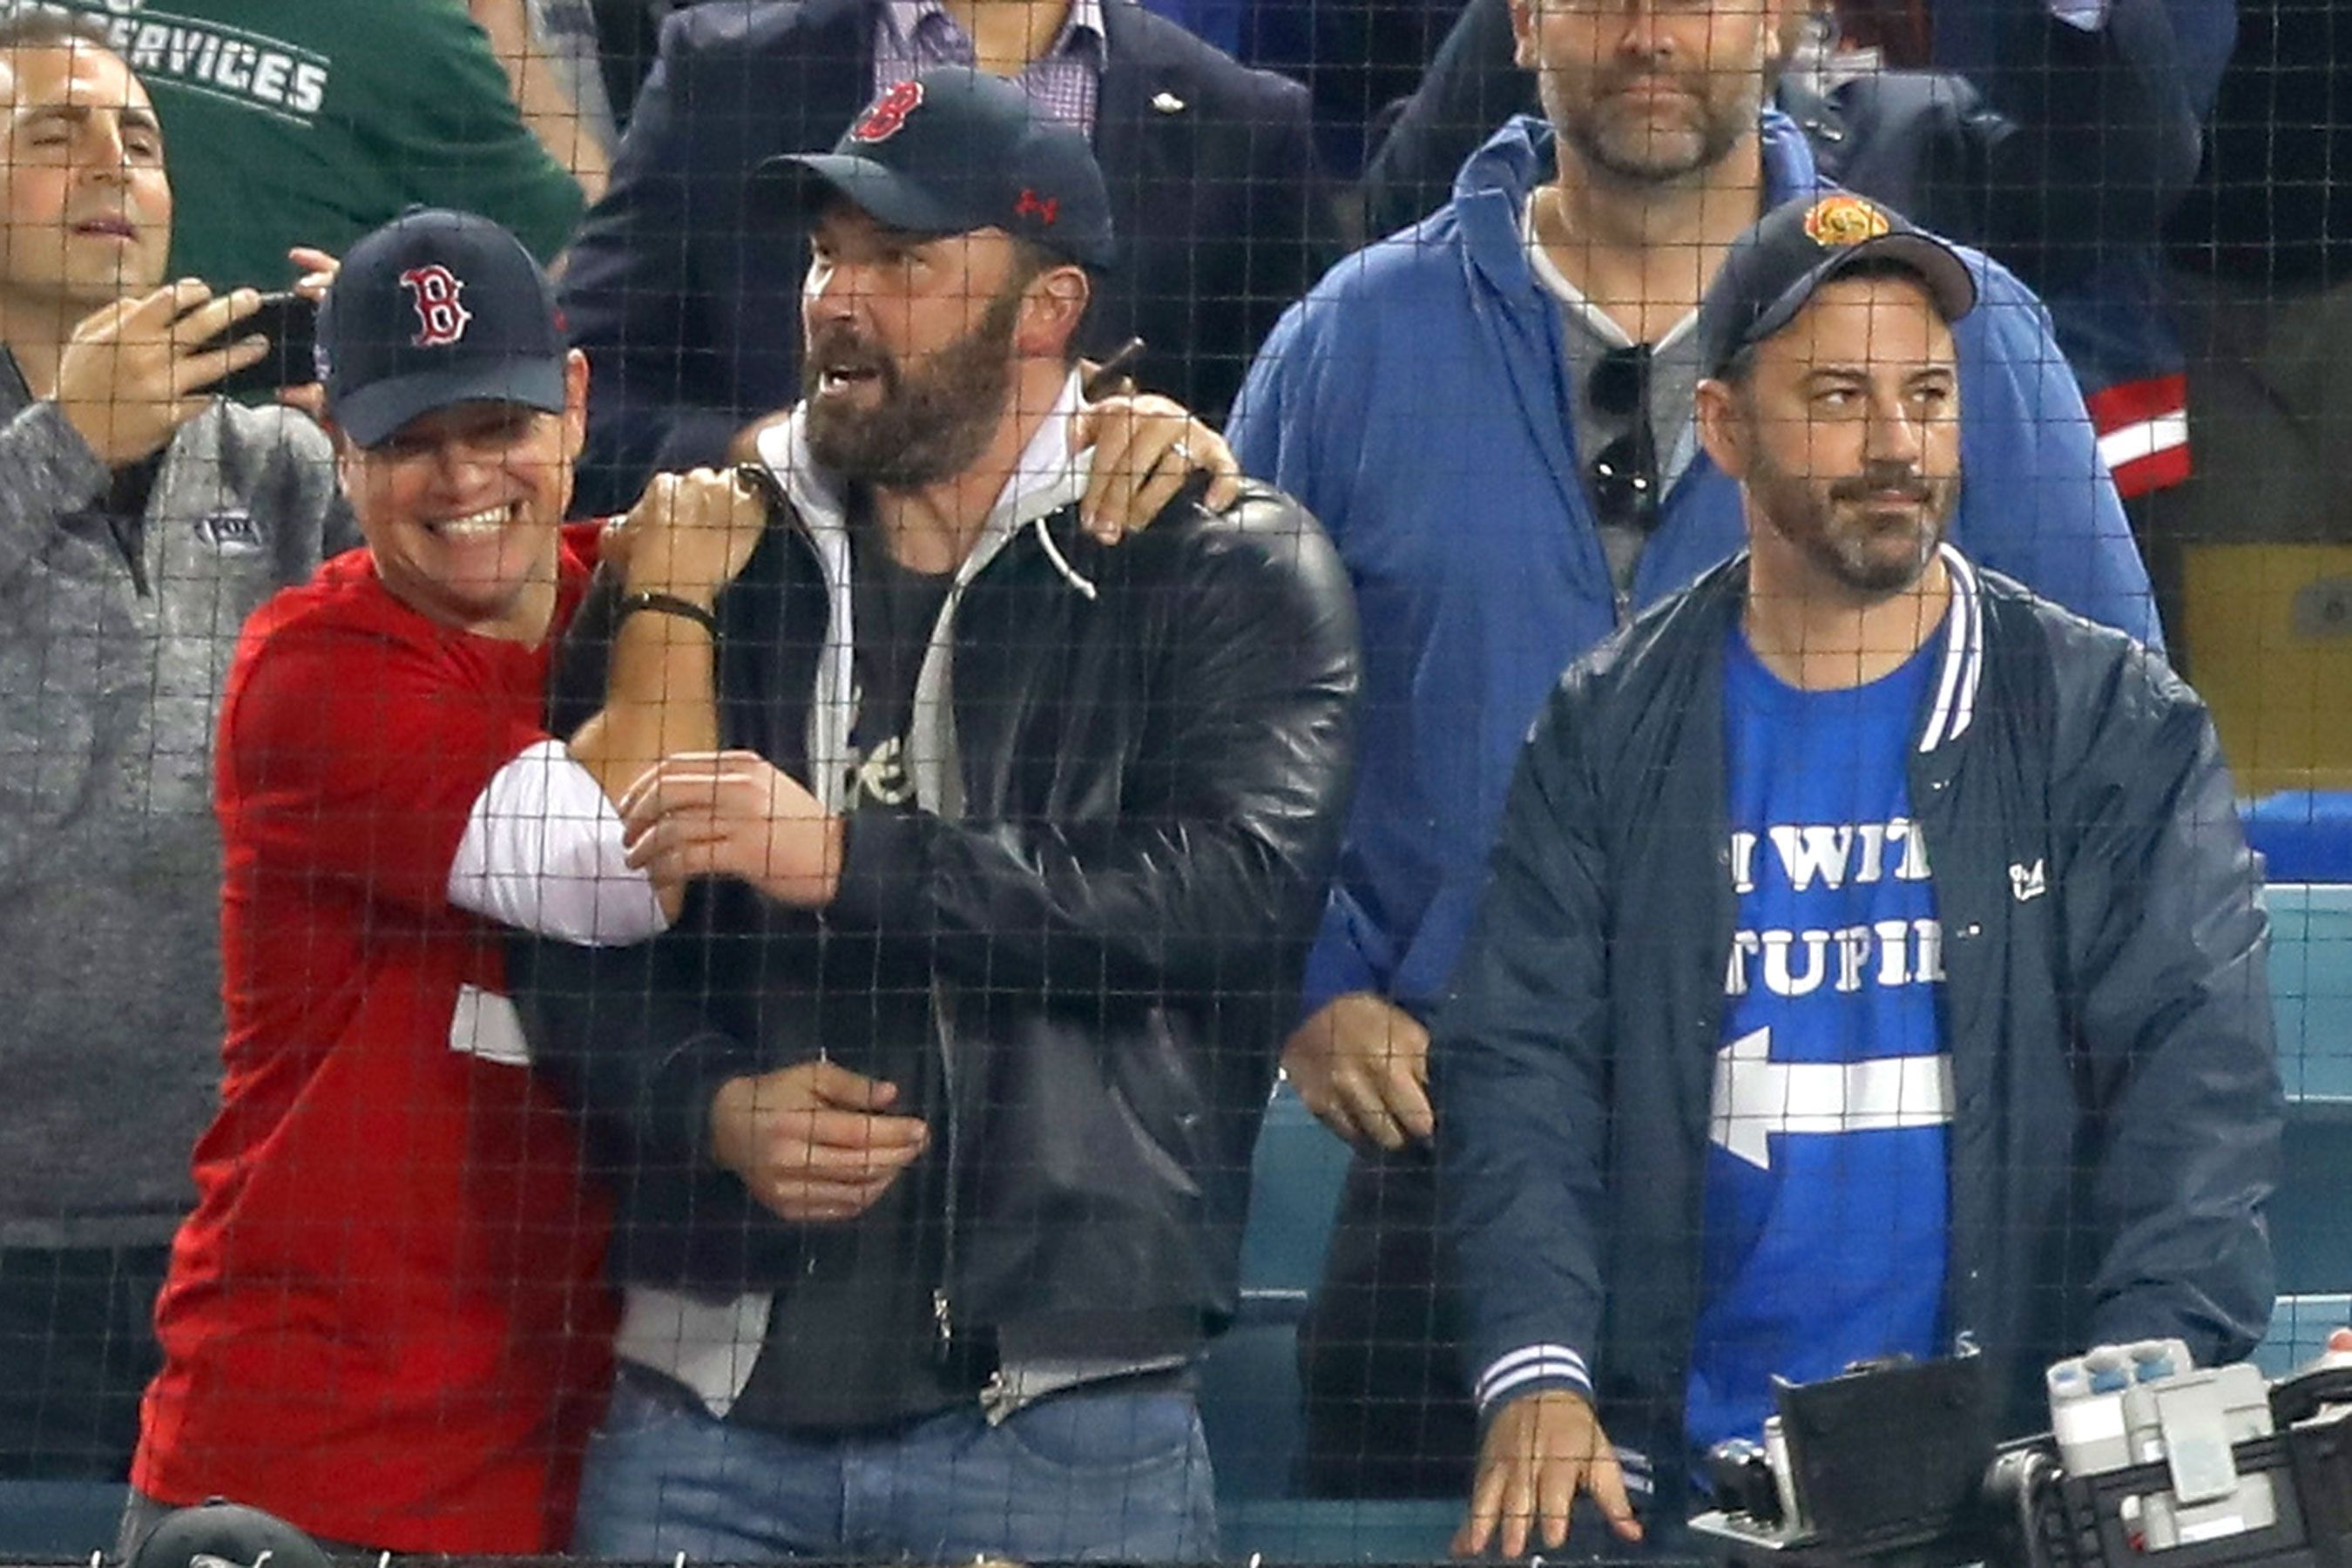 Matt Damon Ben Affleck Cheer On Boston Red Sox Day After Affleck Attends Game With Jennifer Garner Ben Affleck Matt Damon Matt Damon Ben Affleck